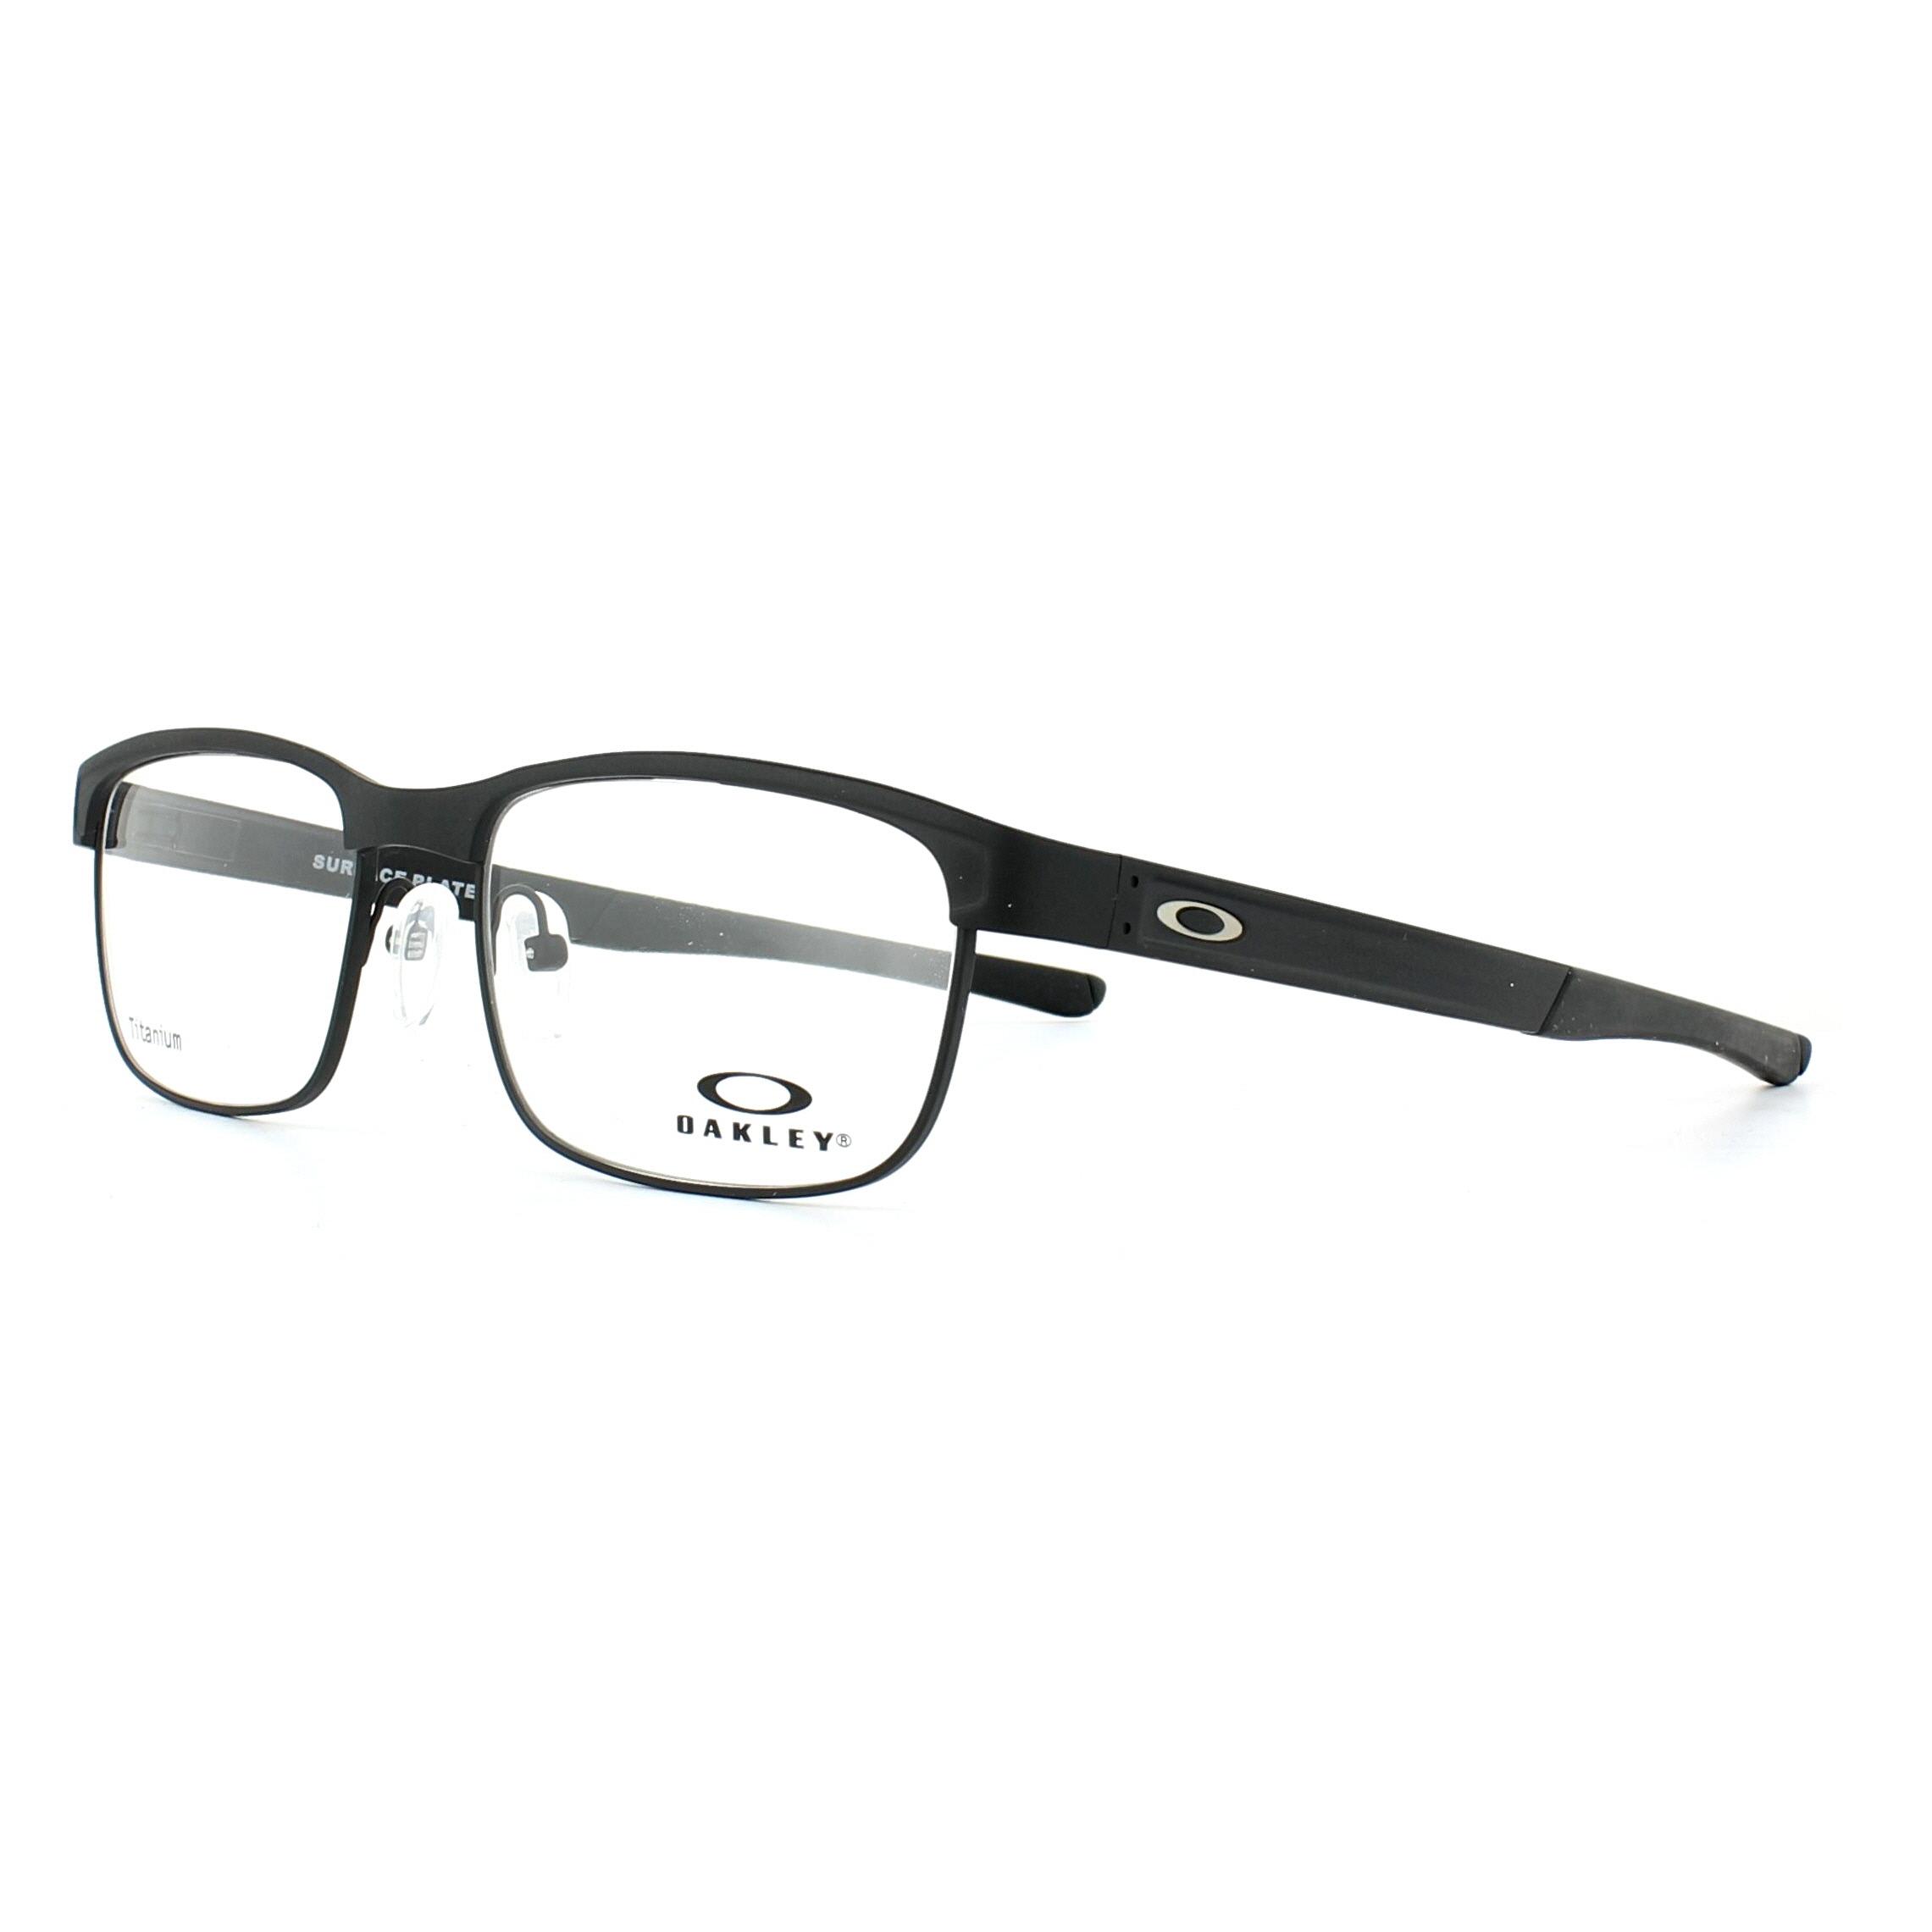 7136392bd641d Sentinel Thumbnail 1. Sentinel Oakley Glasses Frames Surface Plate  OX5132-01 Matt Black 52mm Mens